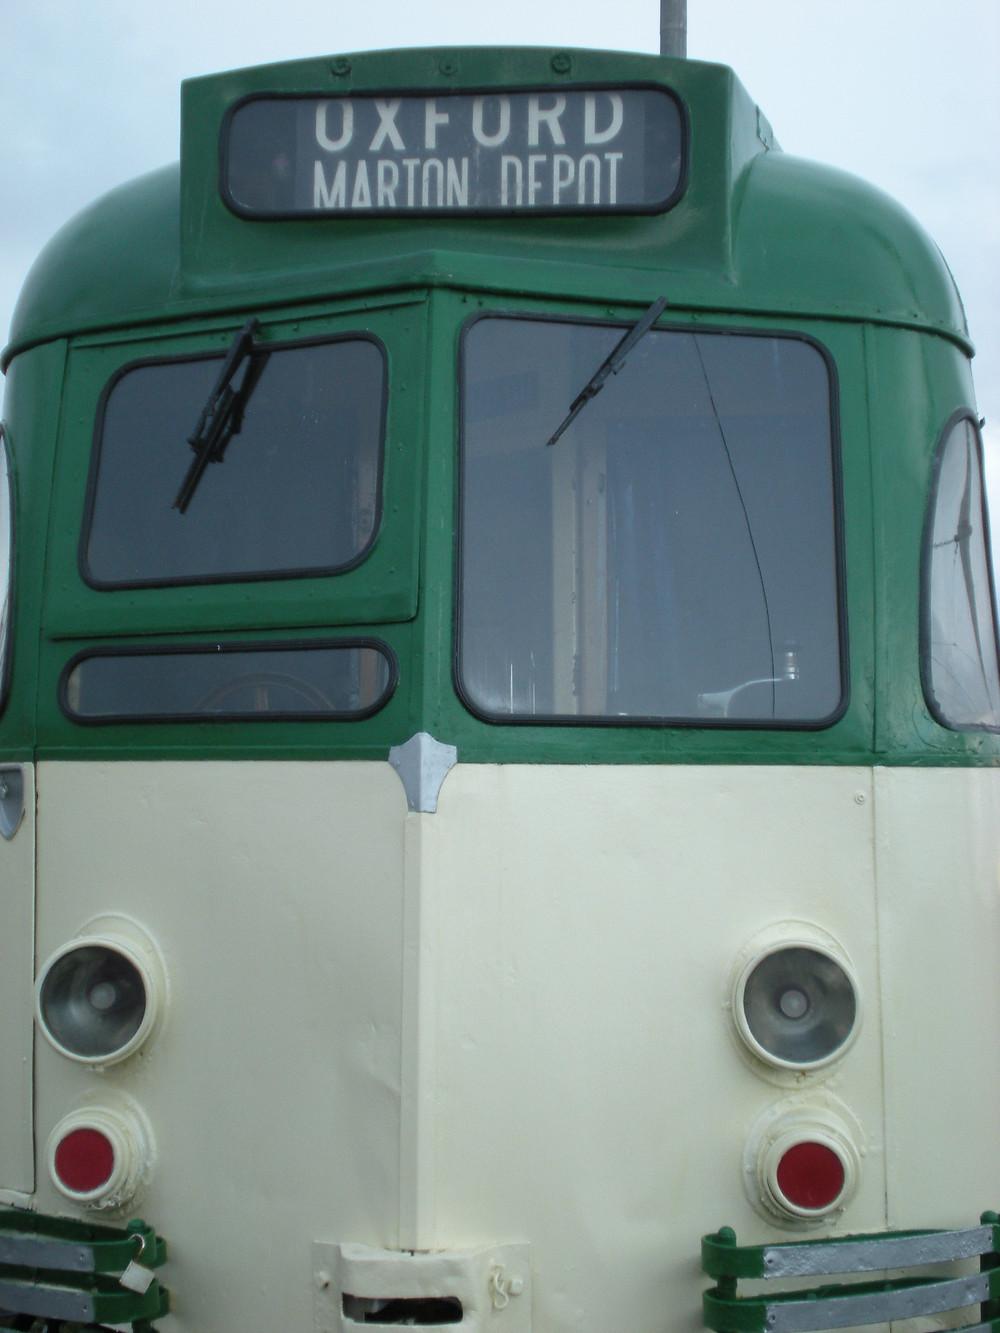 Tram 290 with Oxford, Marton Depot destination.jpg